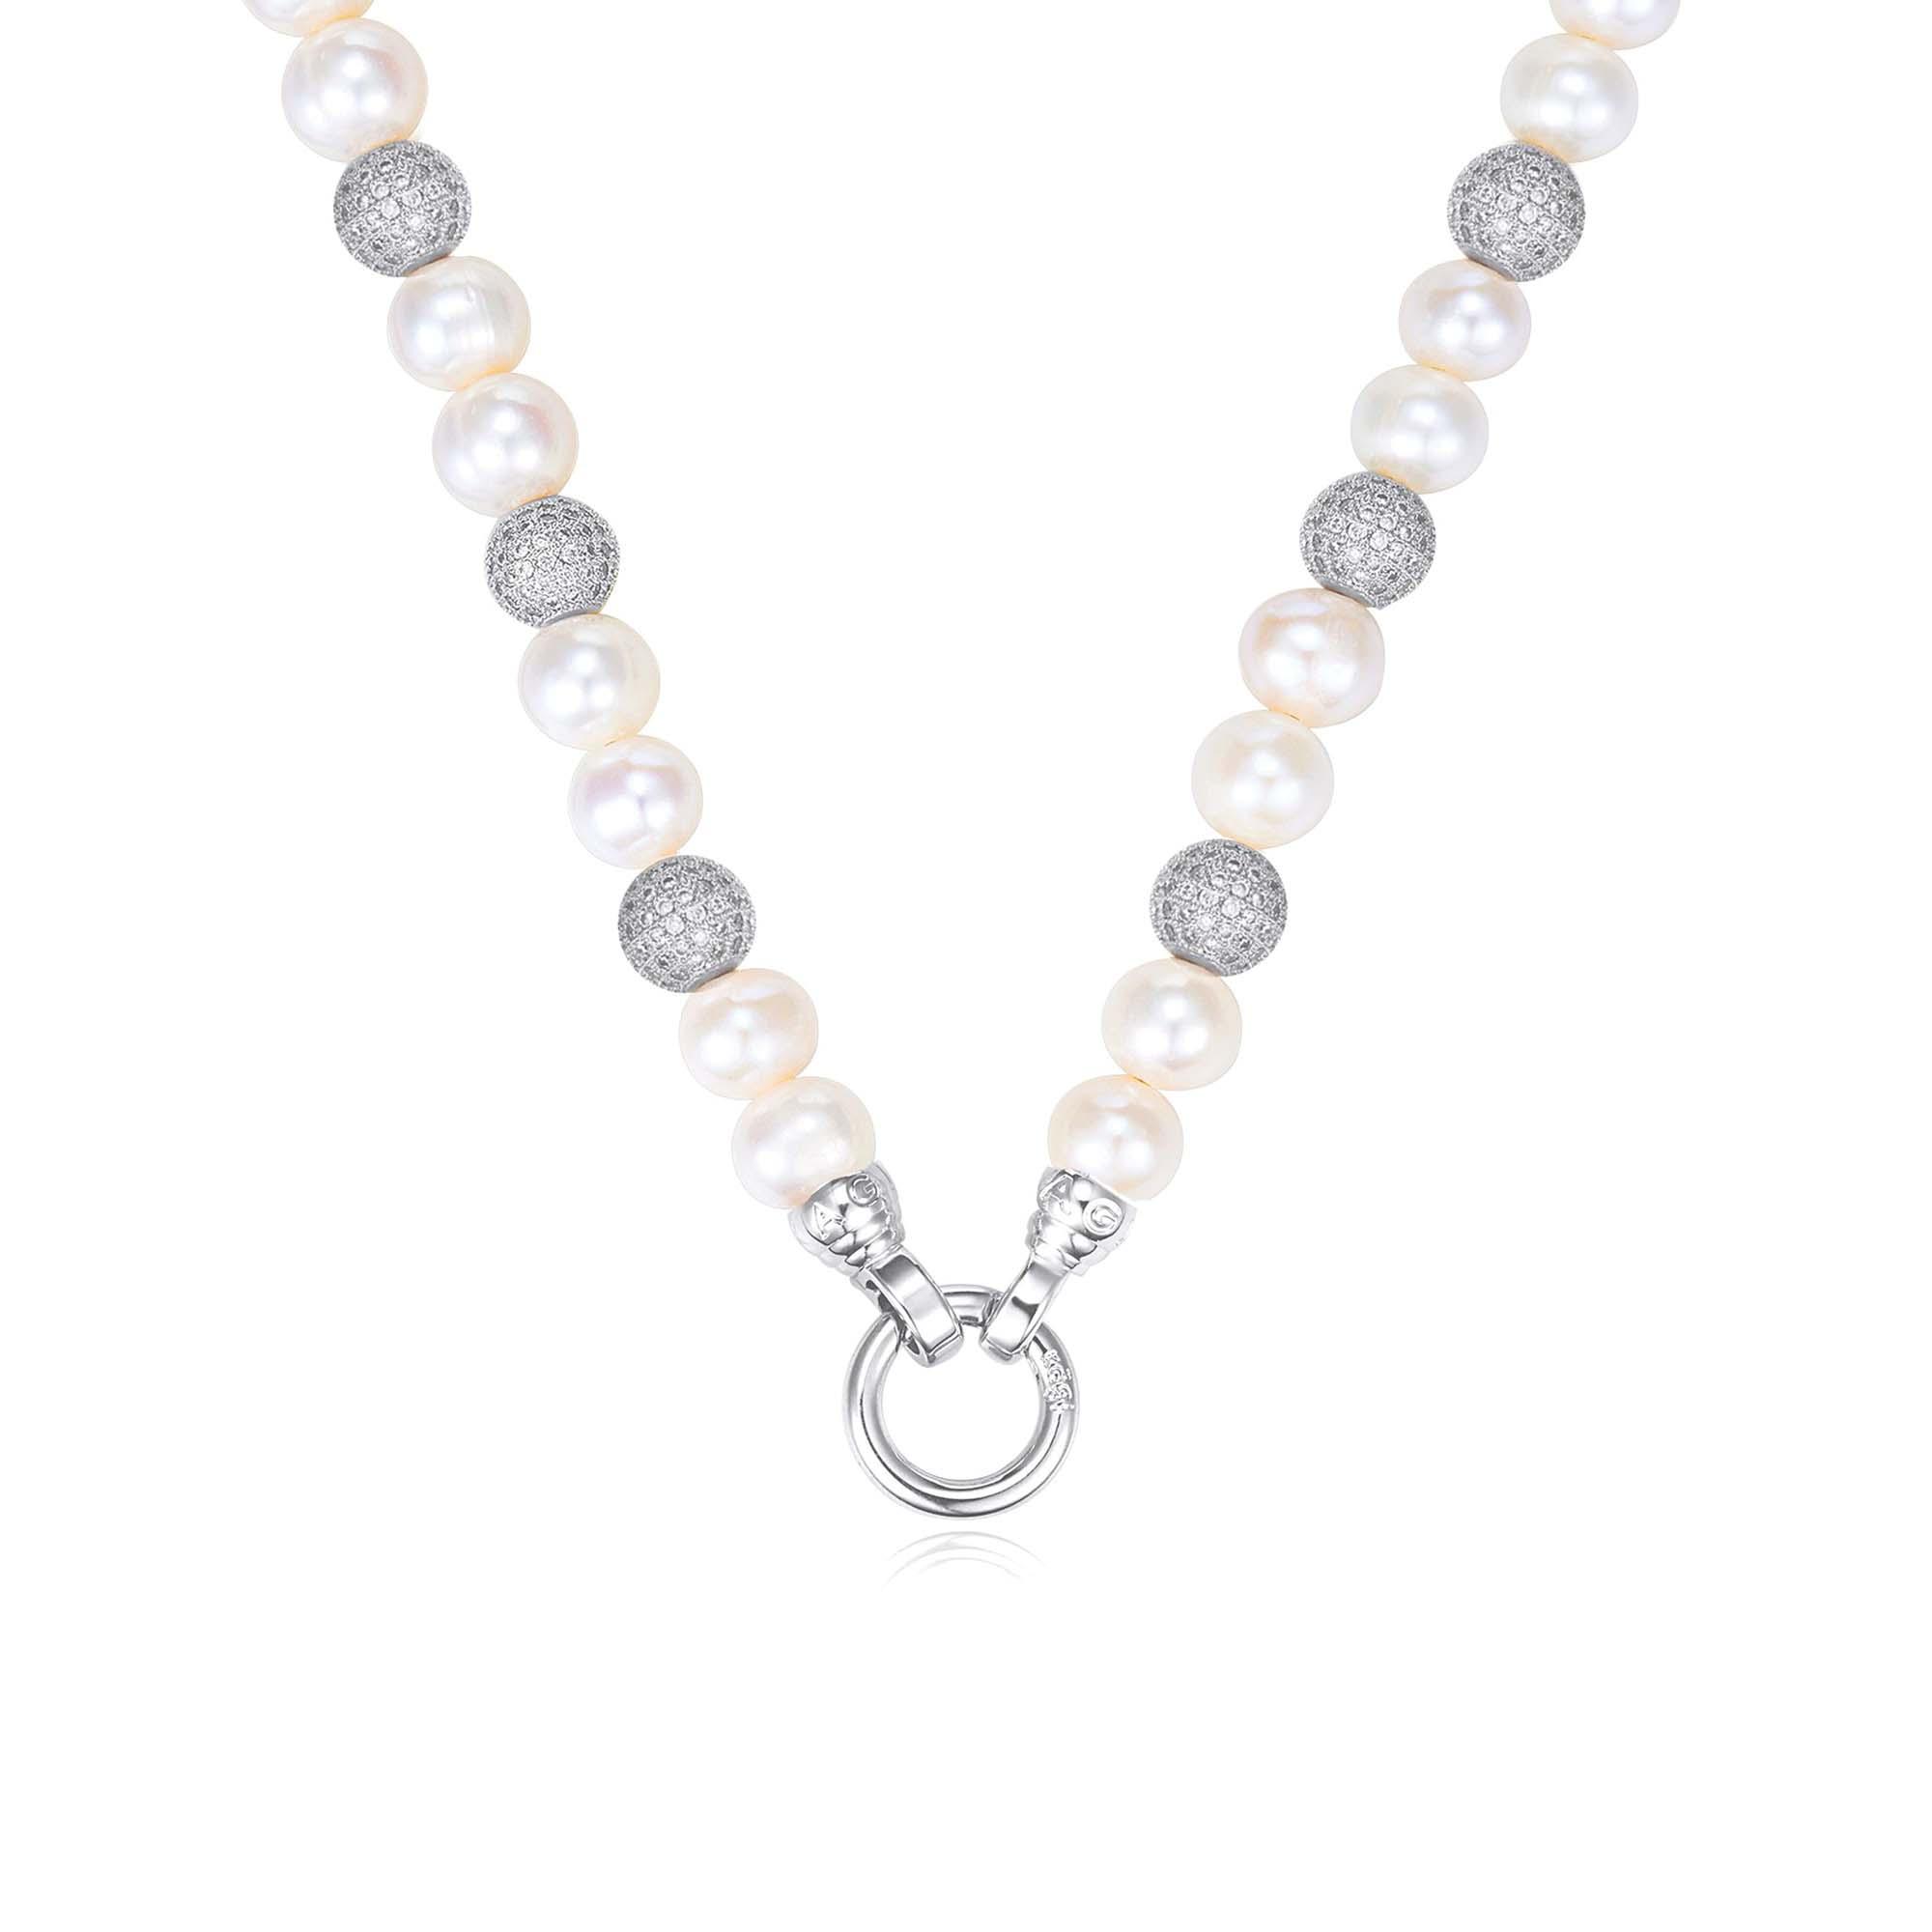 Kagi Pearl Luxe Necklace 49cm $249 www.kagi.net